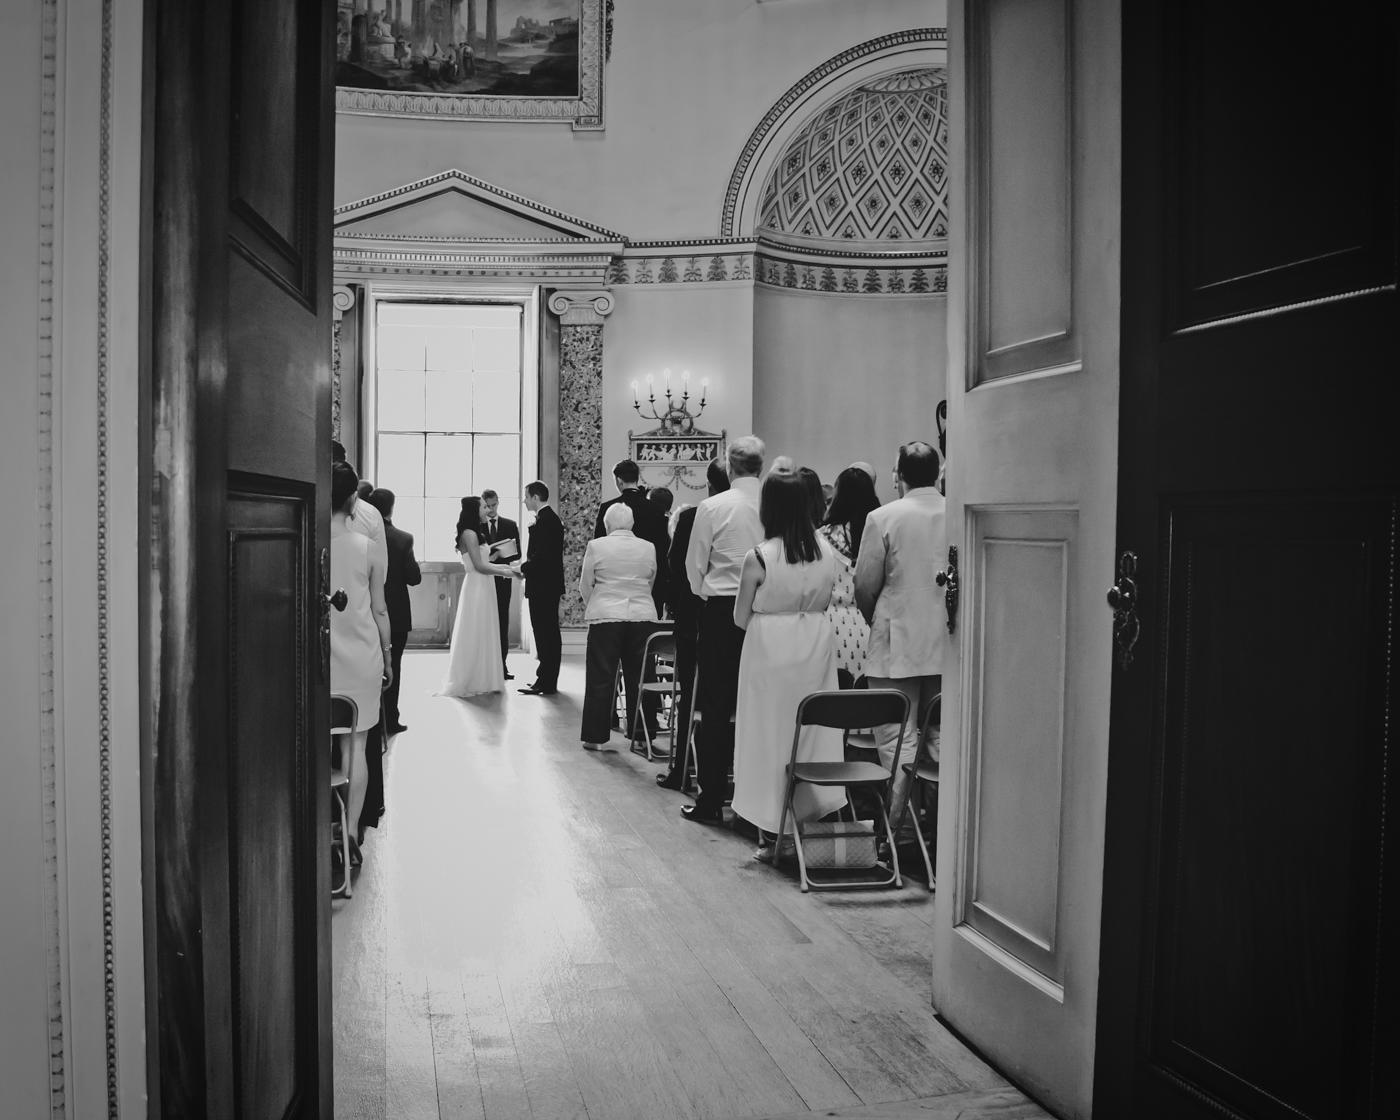 058 - Abi and Chris at Kedleston Hall - Wedding Photography by Mark Pugh www.markpugh.com - 5338.JPG